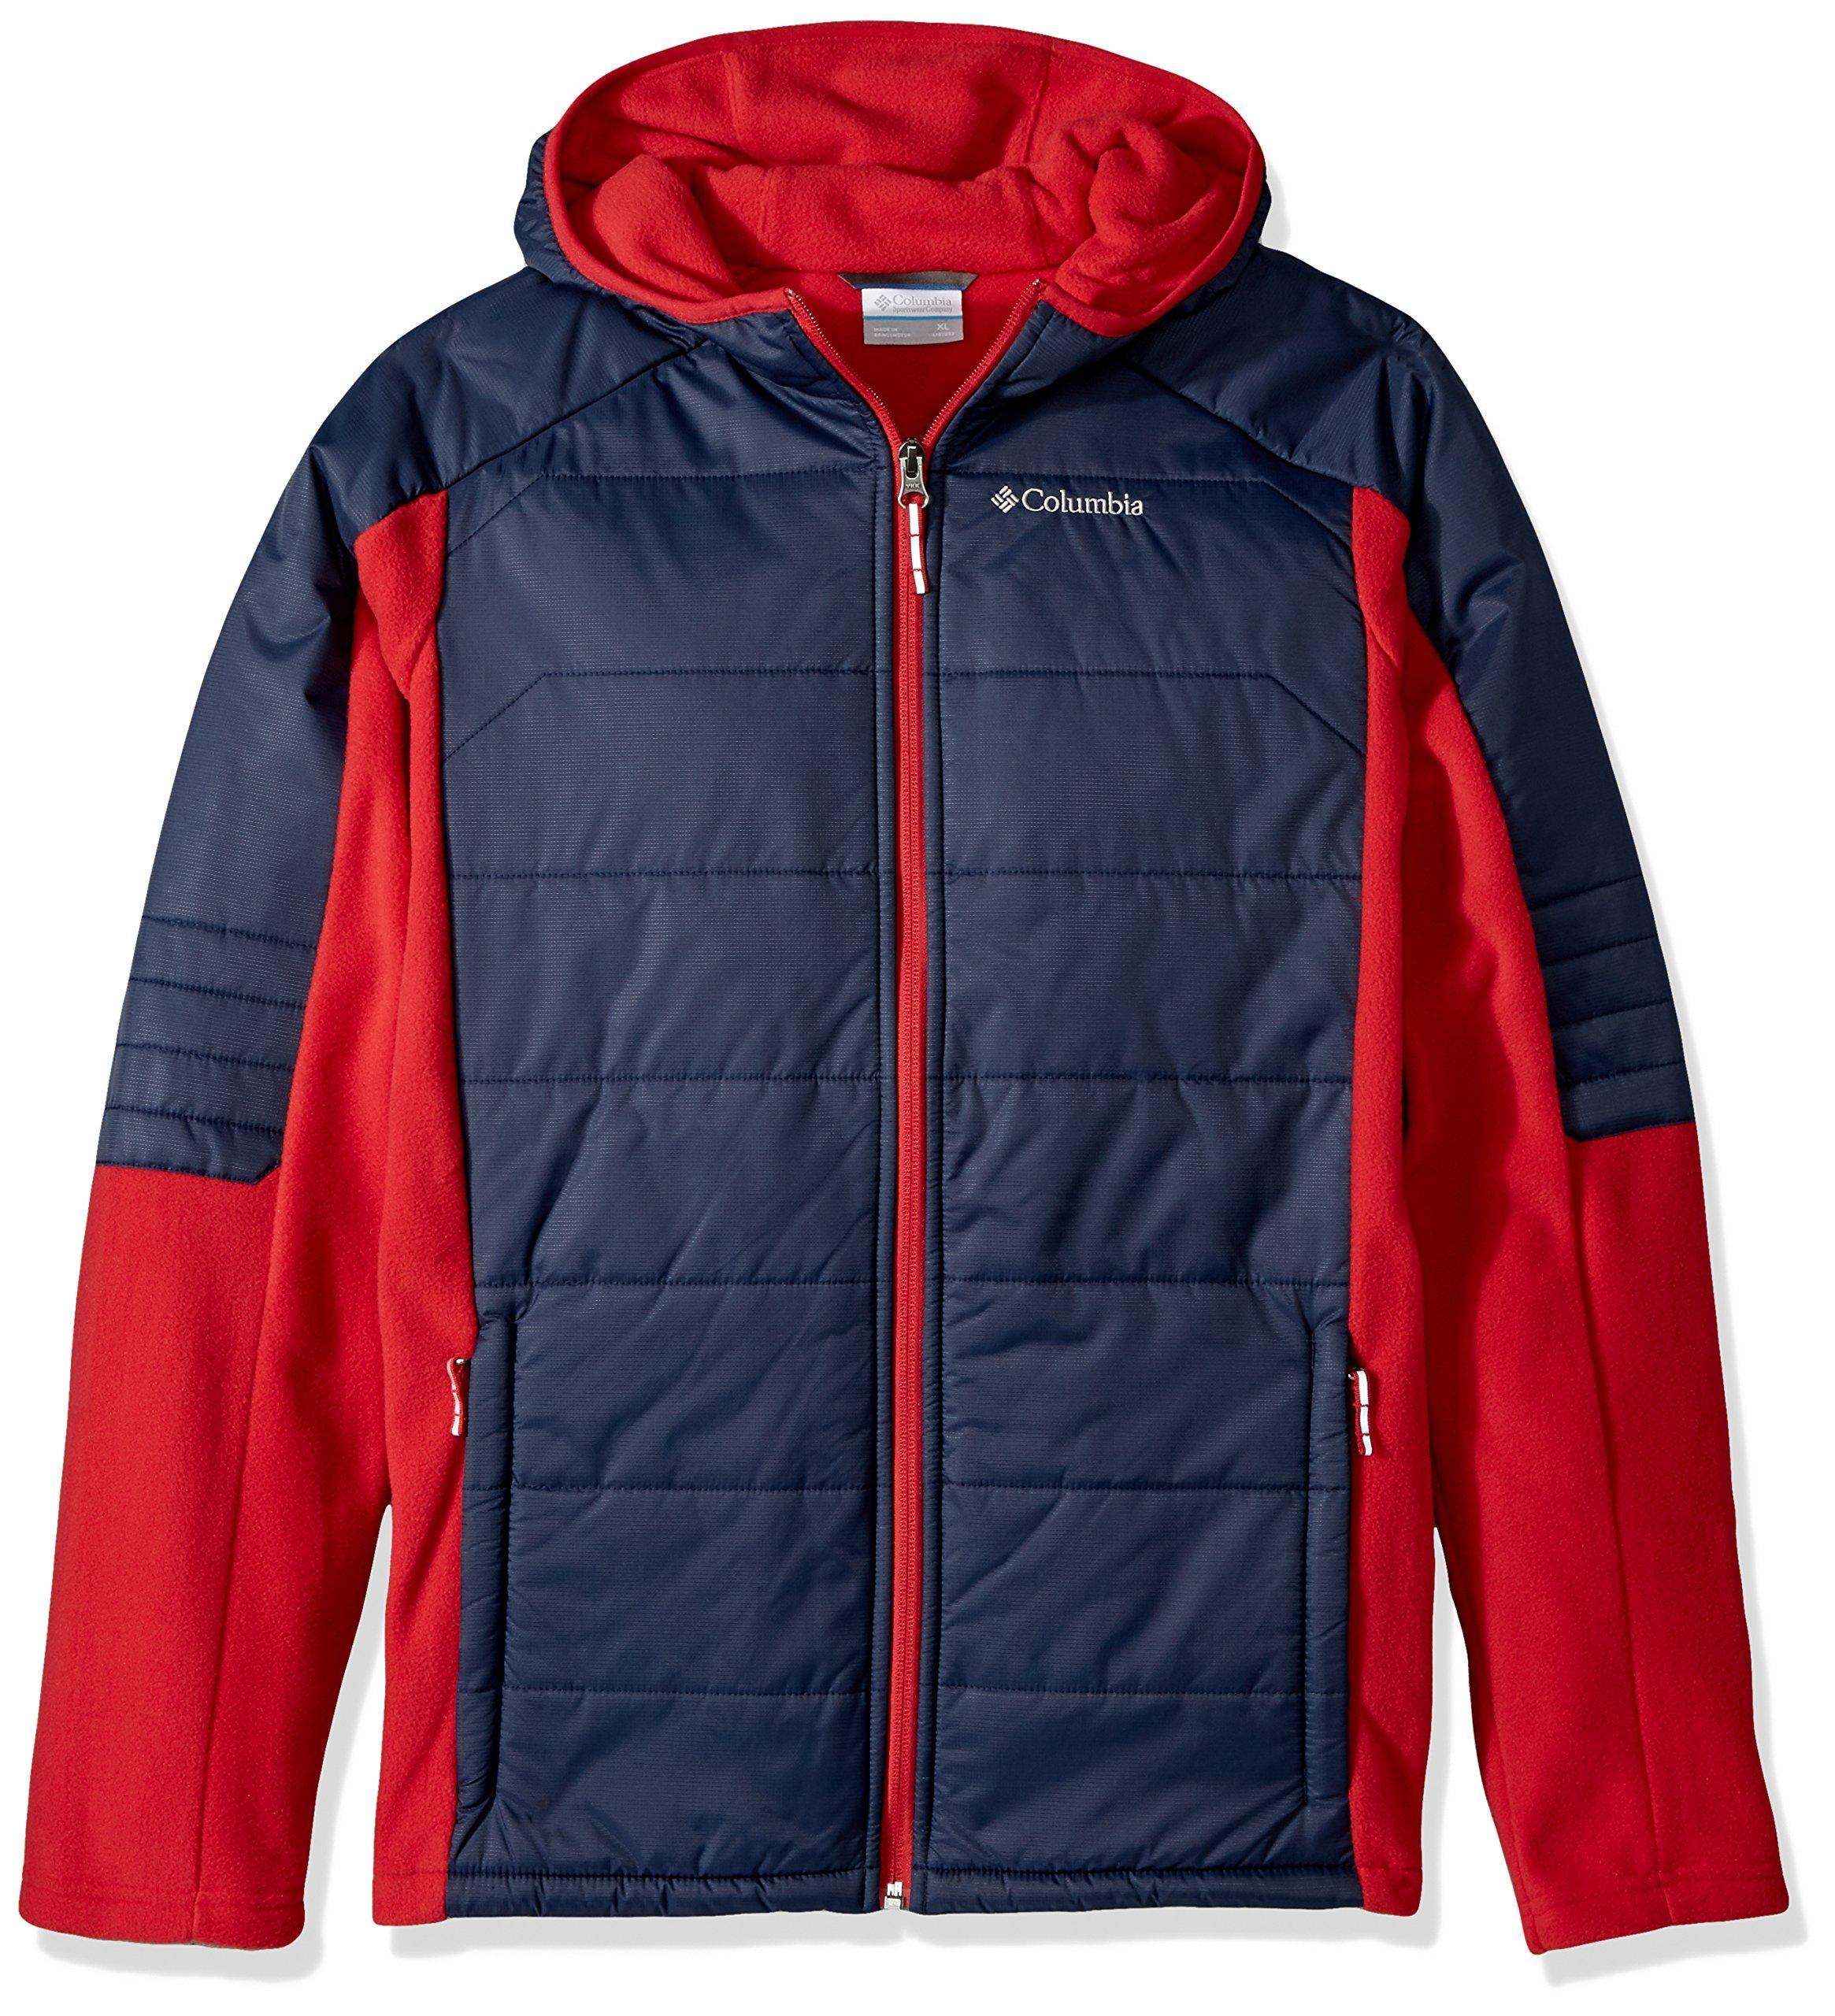 0dade081 Cheap Columbia Fast Trek Fleece Jacket, find Columbia Fast Trek ...